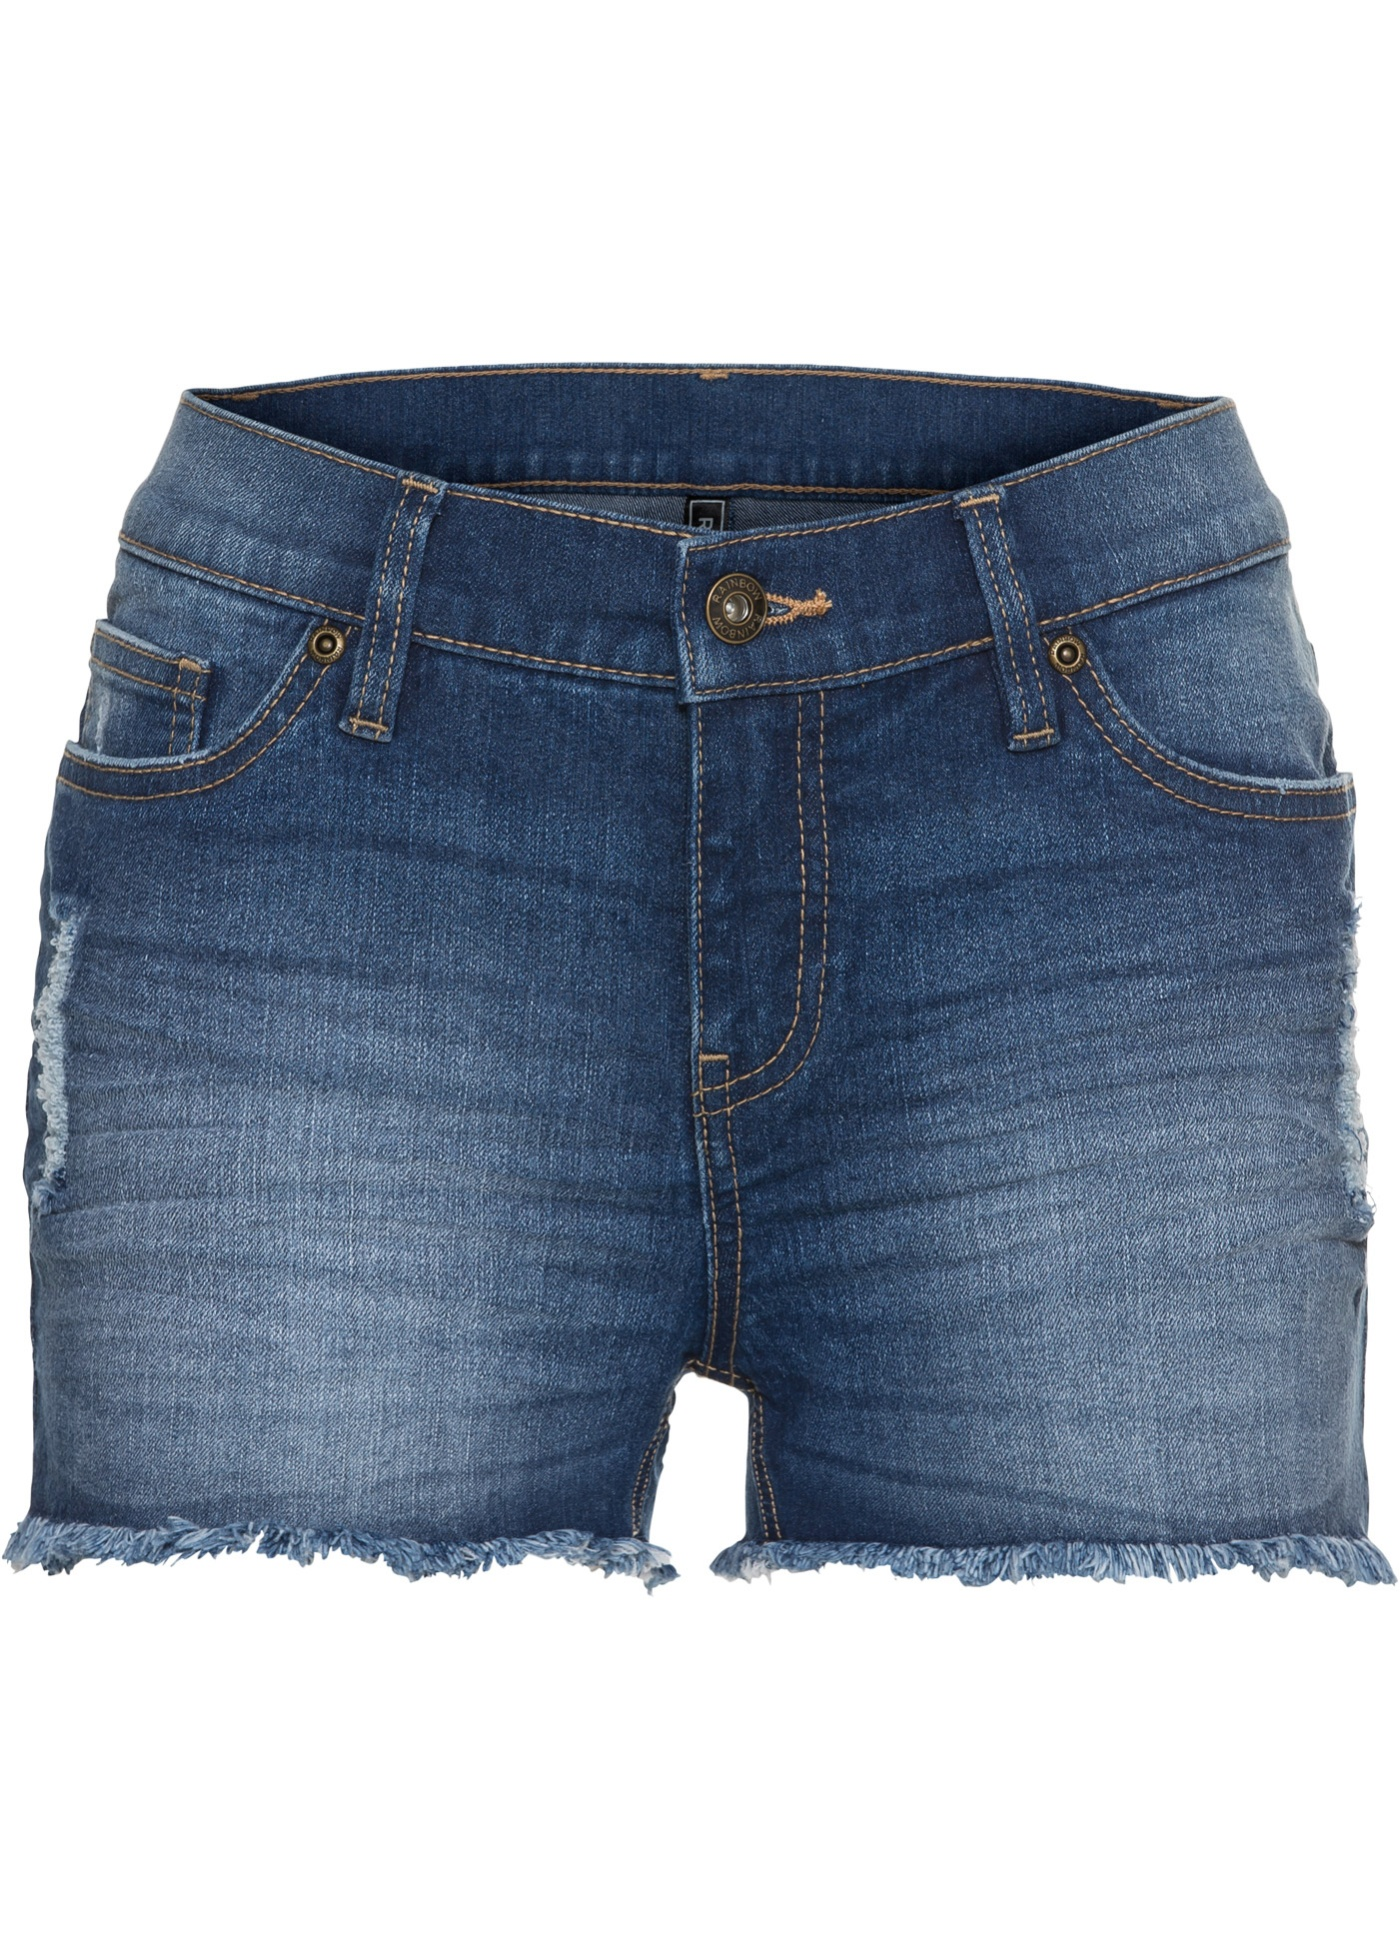 Bonprix SE - Jeans hotpants 199.00